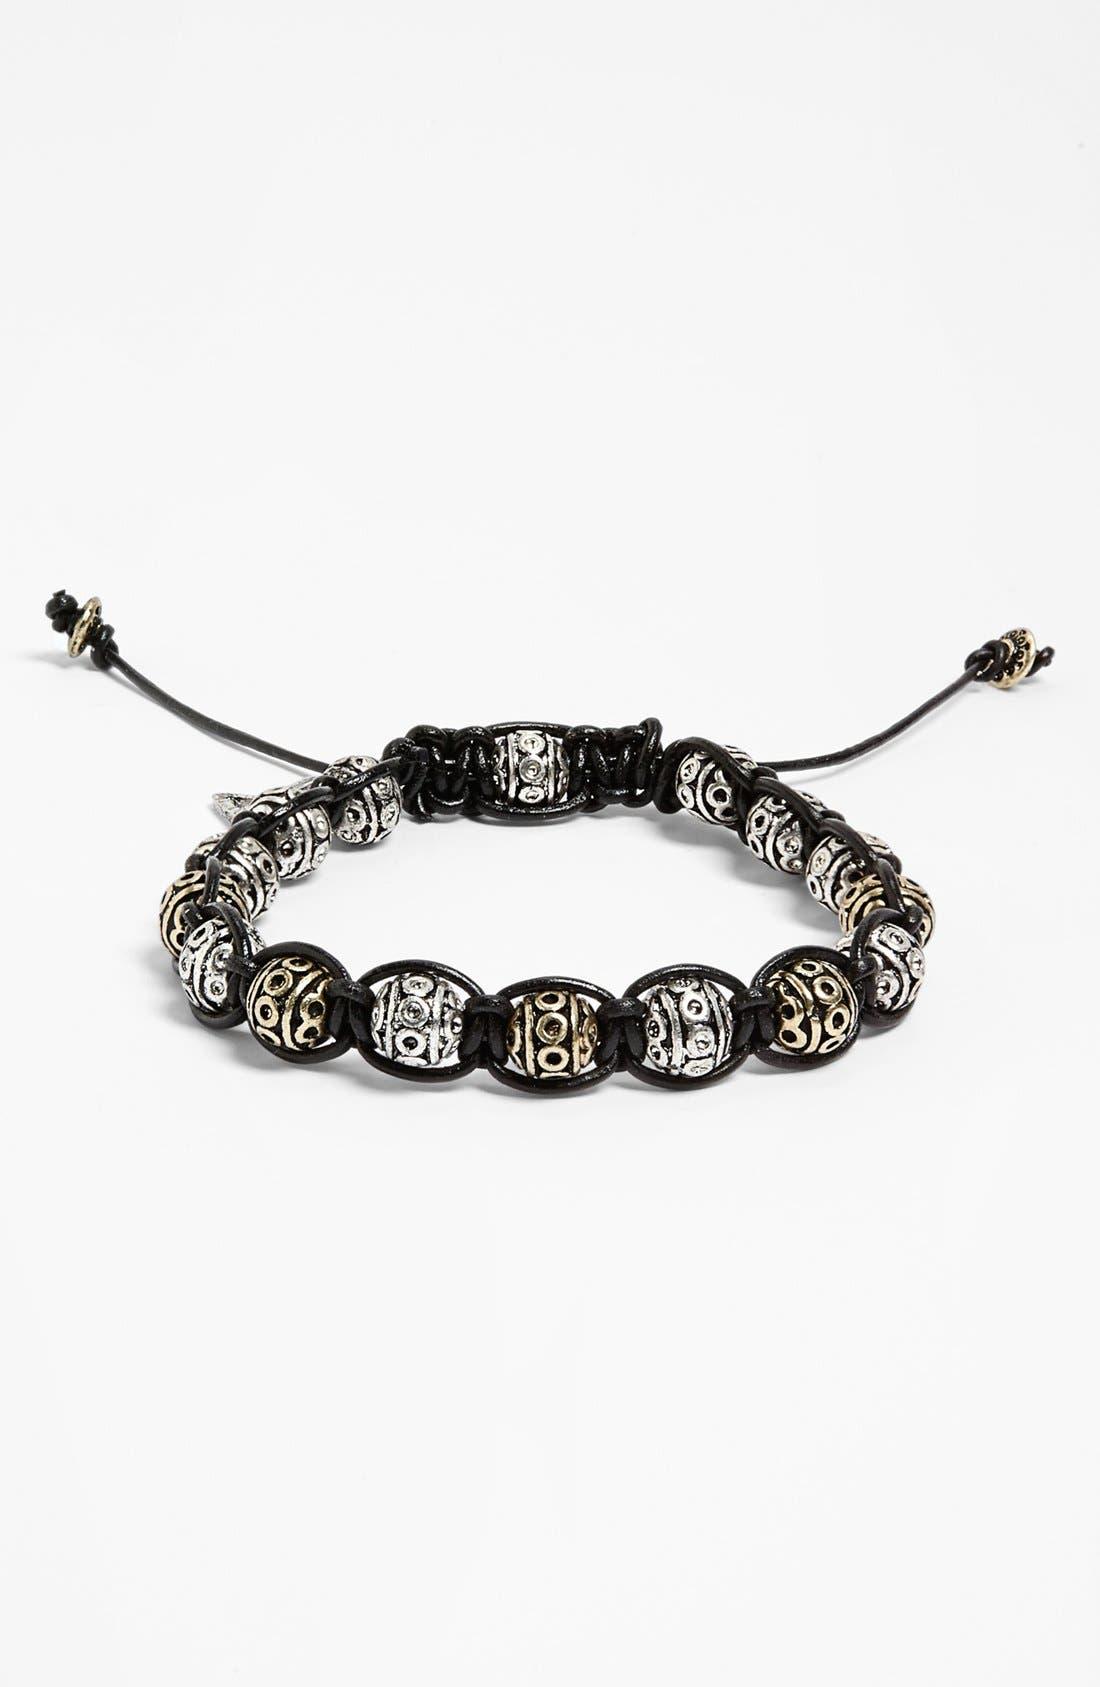 Main Image - Talon Adjustable Bracelet